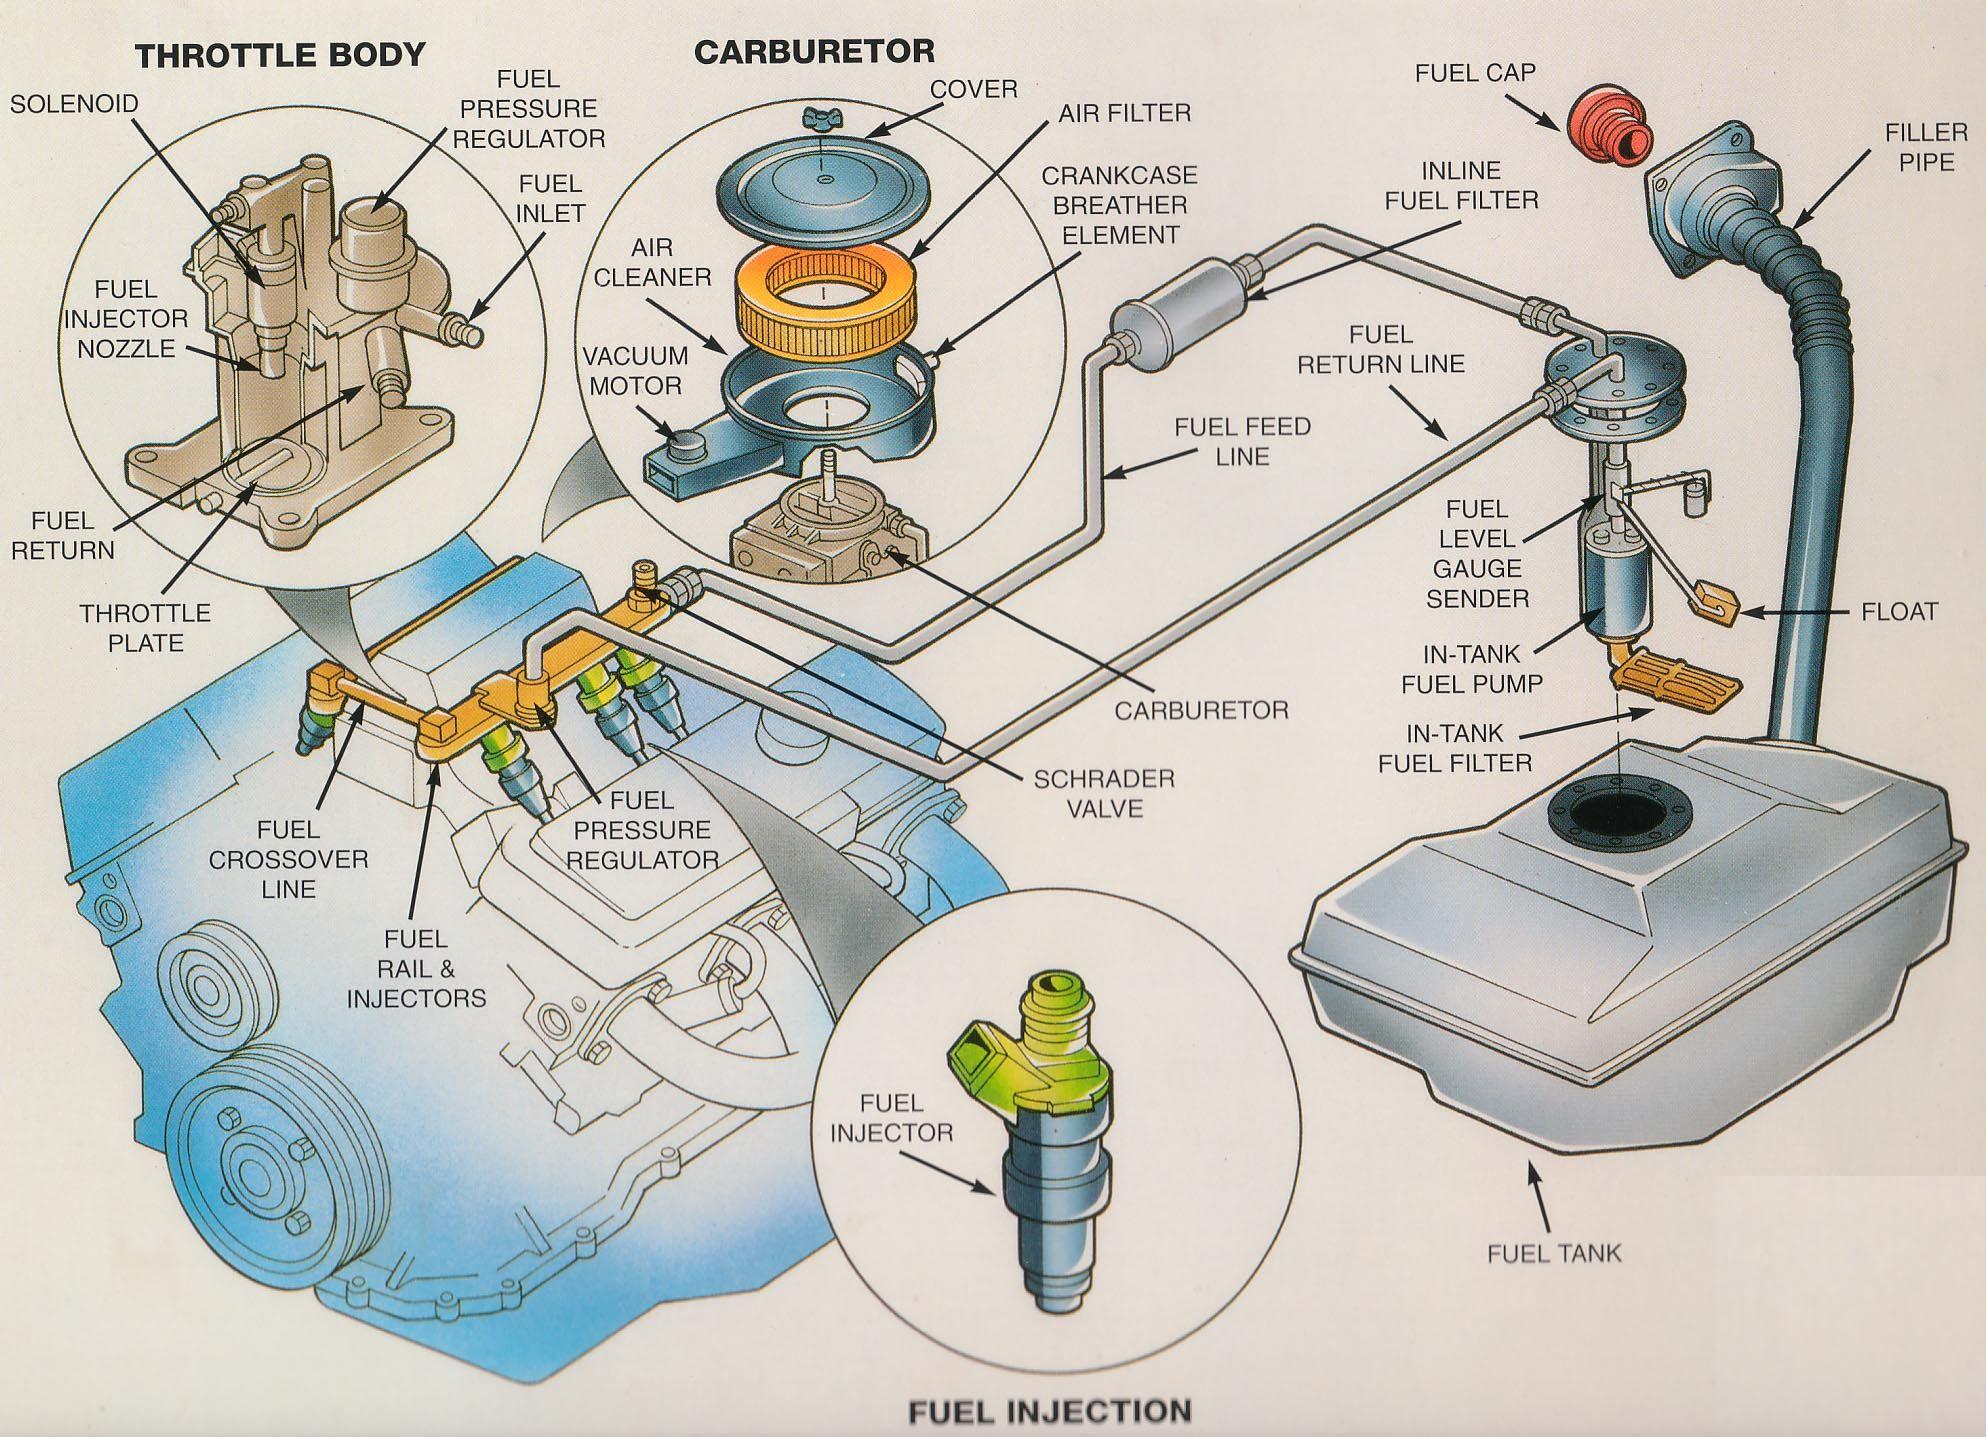 Car Fuel Tank Diagram - Go Wiring Diagrams Oldsmobile Fuel Pressure Diagram on